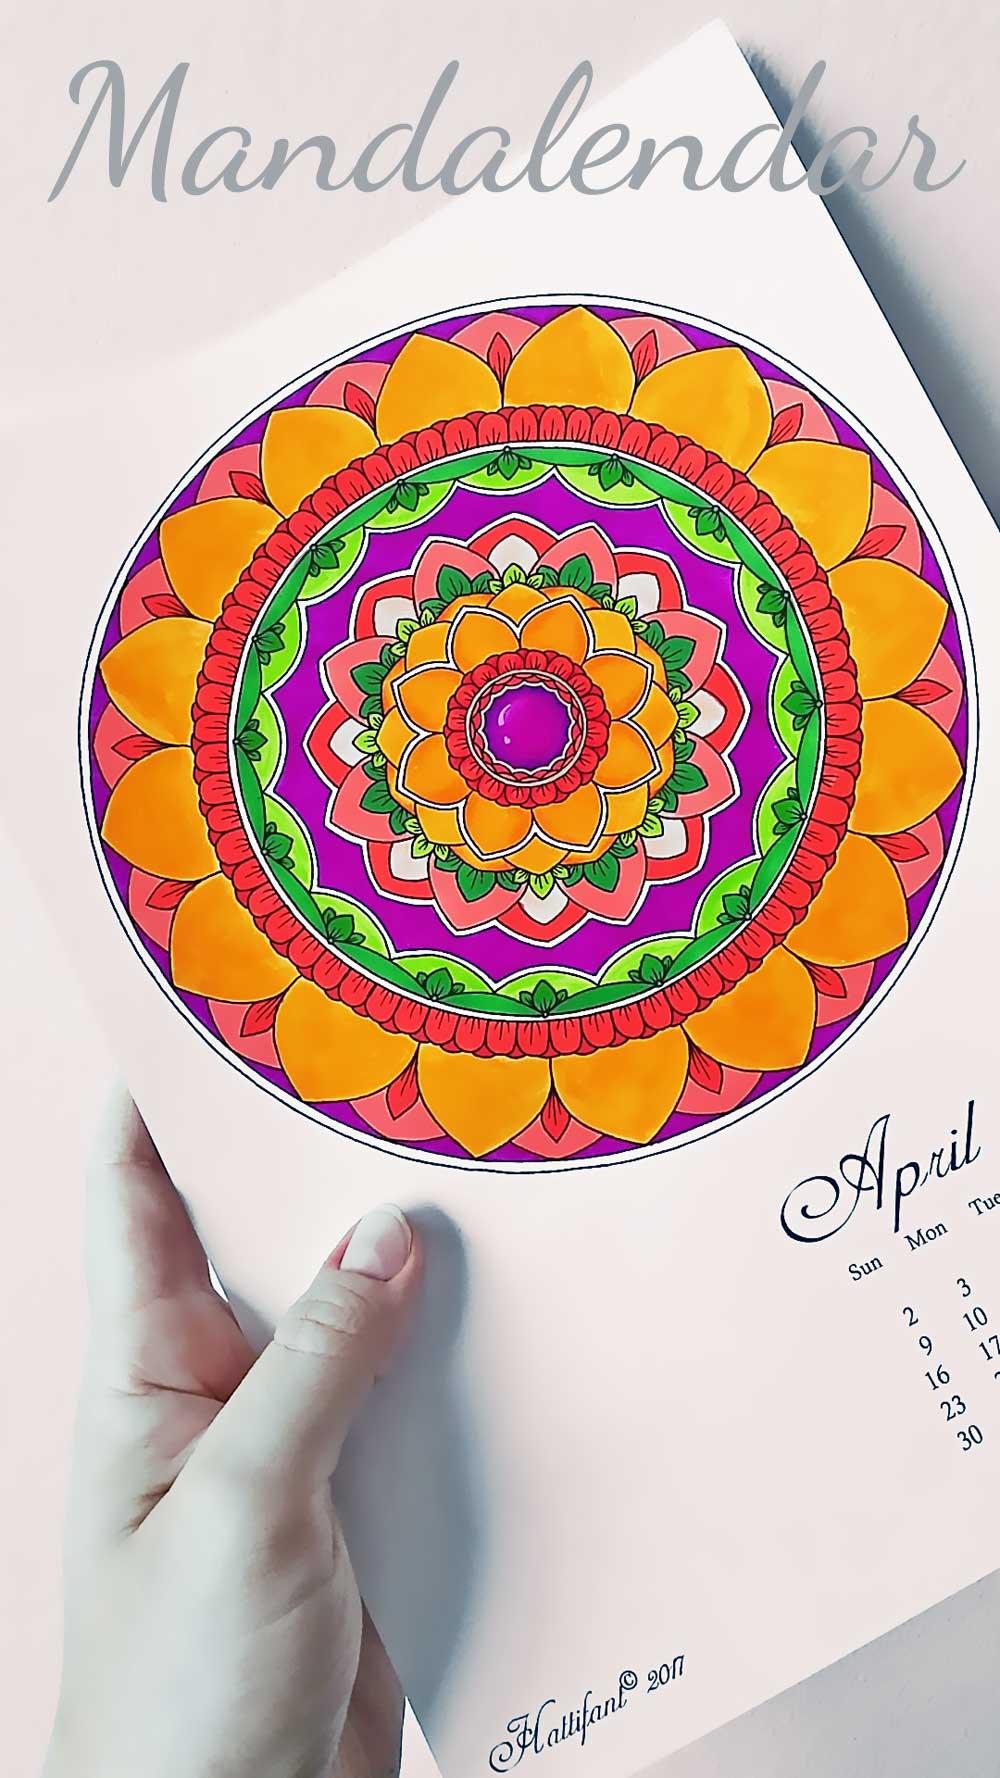 Hattifant's Mandalandar 2017 a Mandala Calendar Coloring Page for April to download for free during April